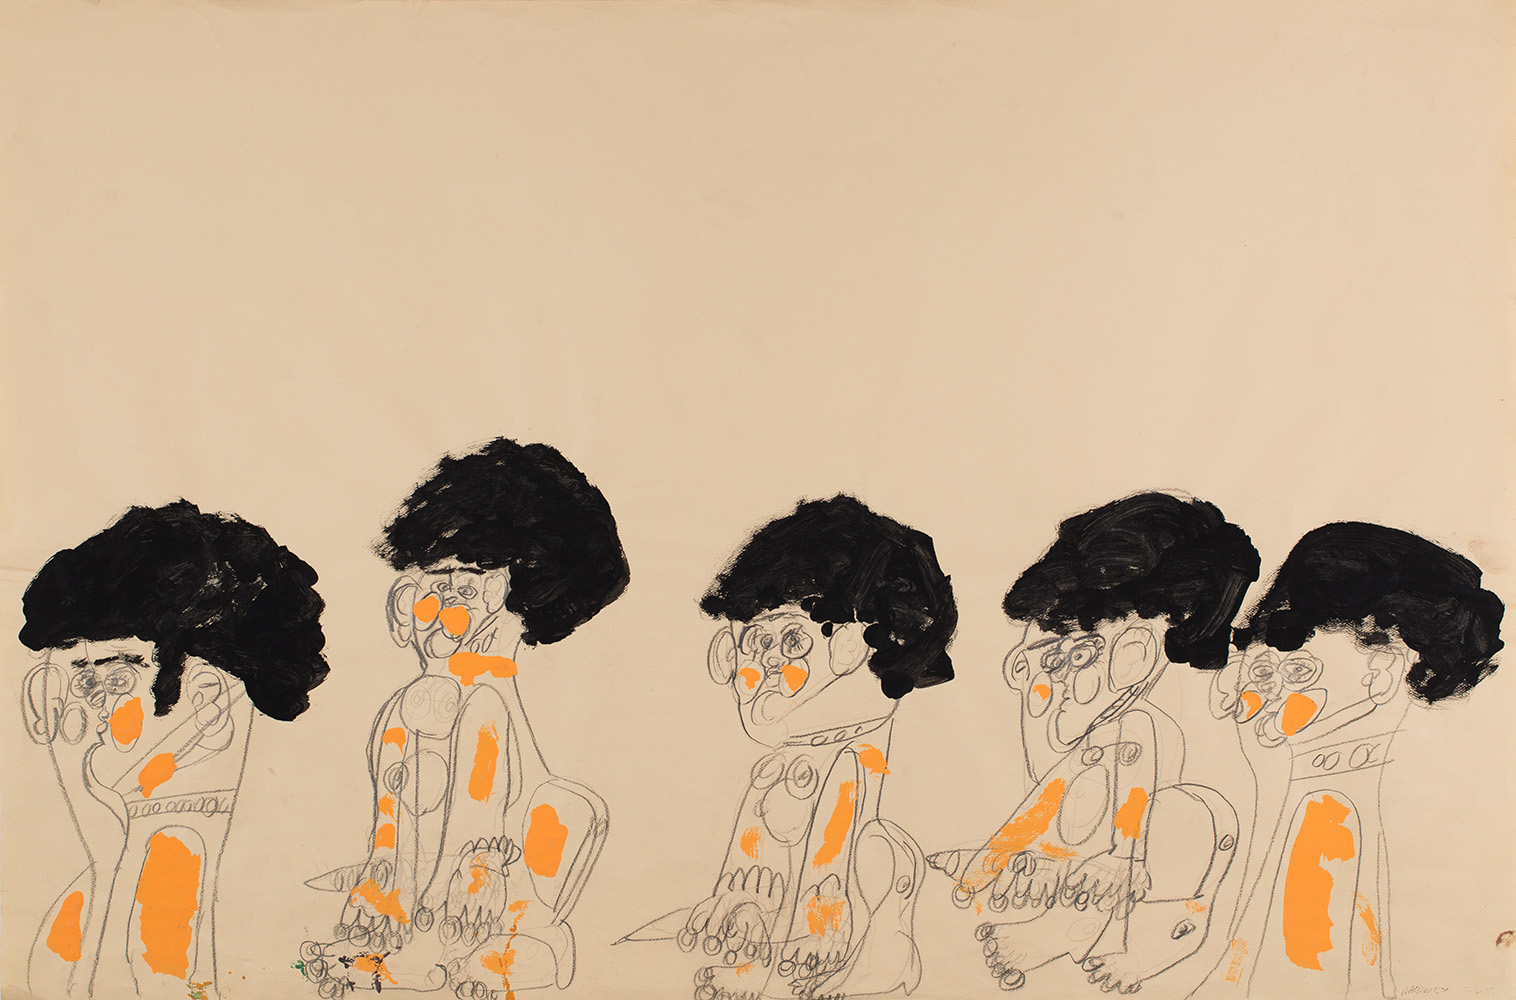 Dwight Mackintosh  Untitled  , 1983 Ink on paper 23 x 35 inches 58.4 x 88.9 cm DwM 4